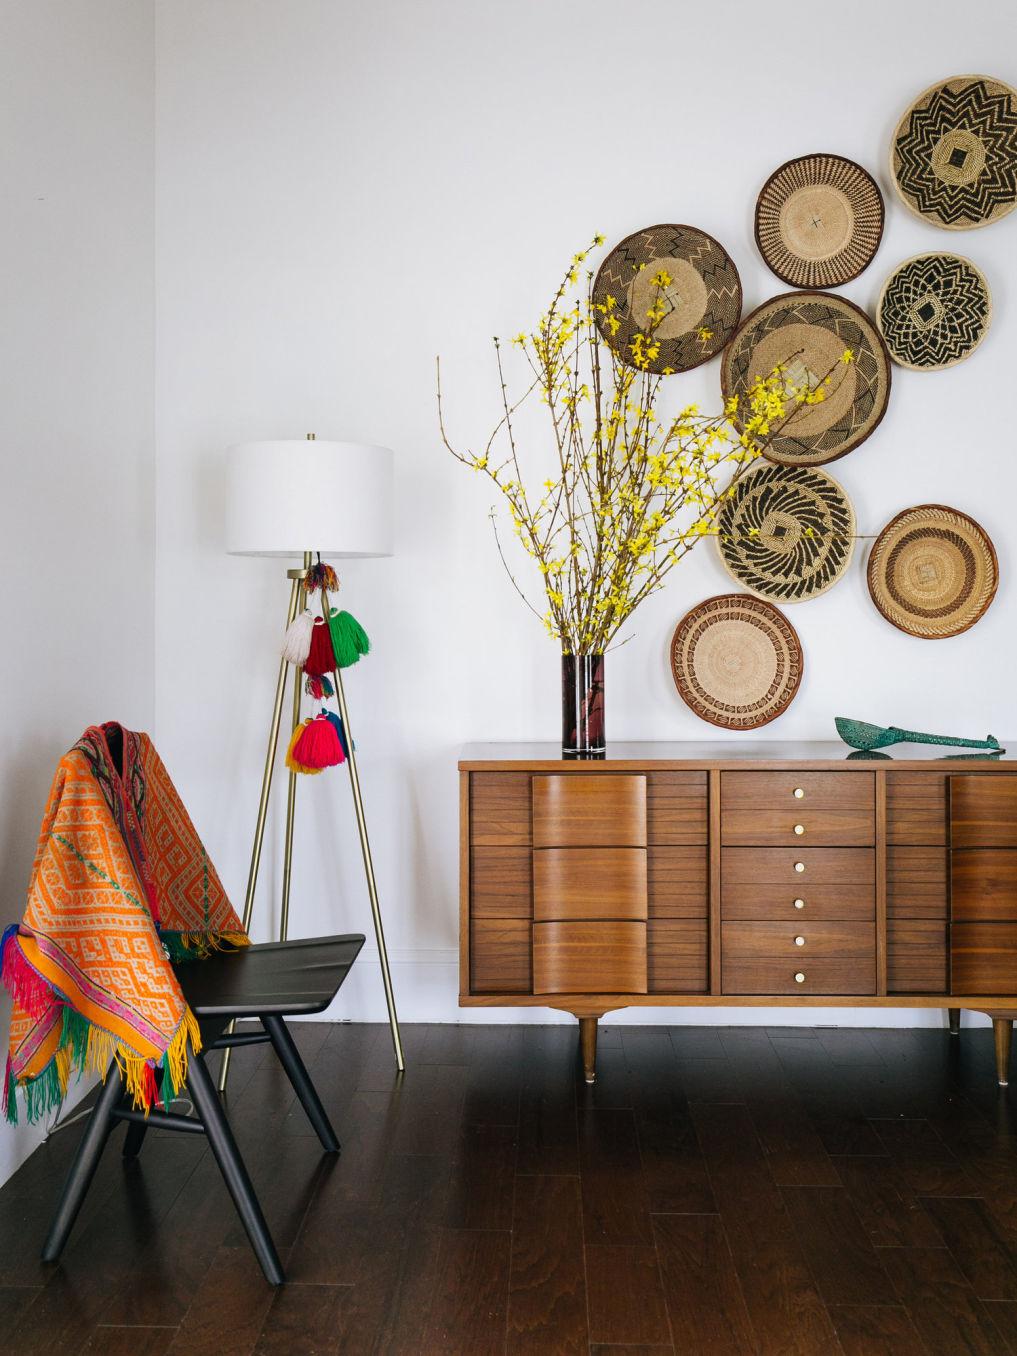 Beautiful basket gallery wall #baskets #basketwall #gallerywall #midcentury #midcenturymodern #vintagedecor #eclecticdecor #bohodecor #decorate